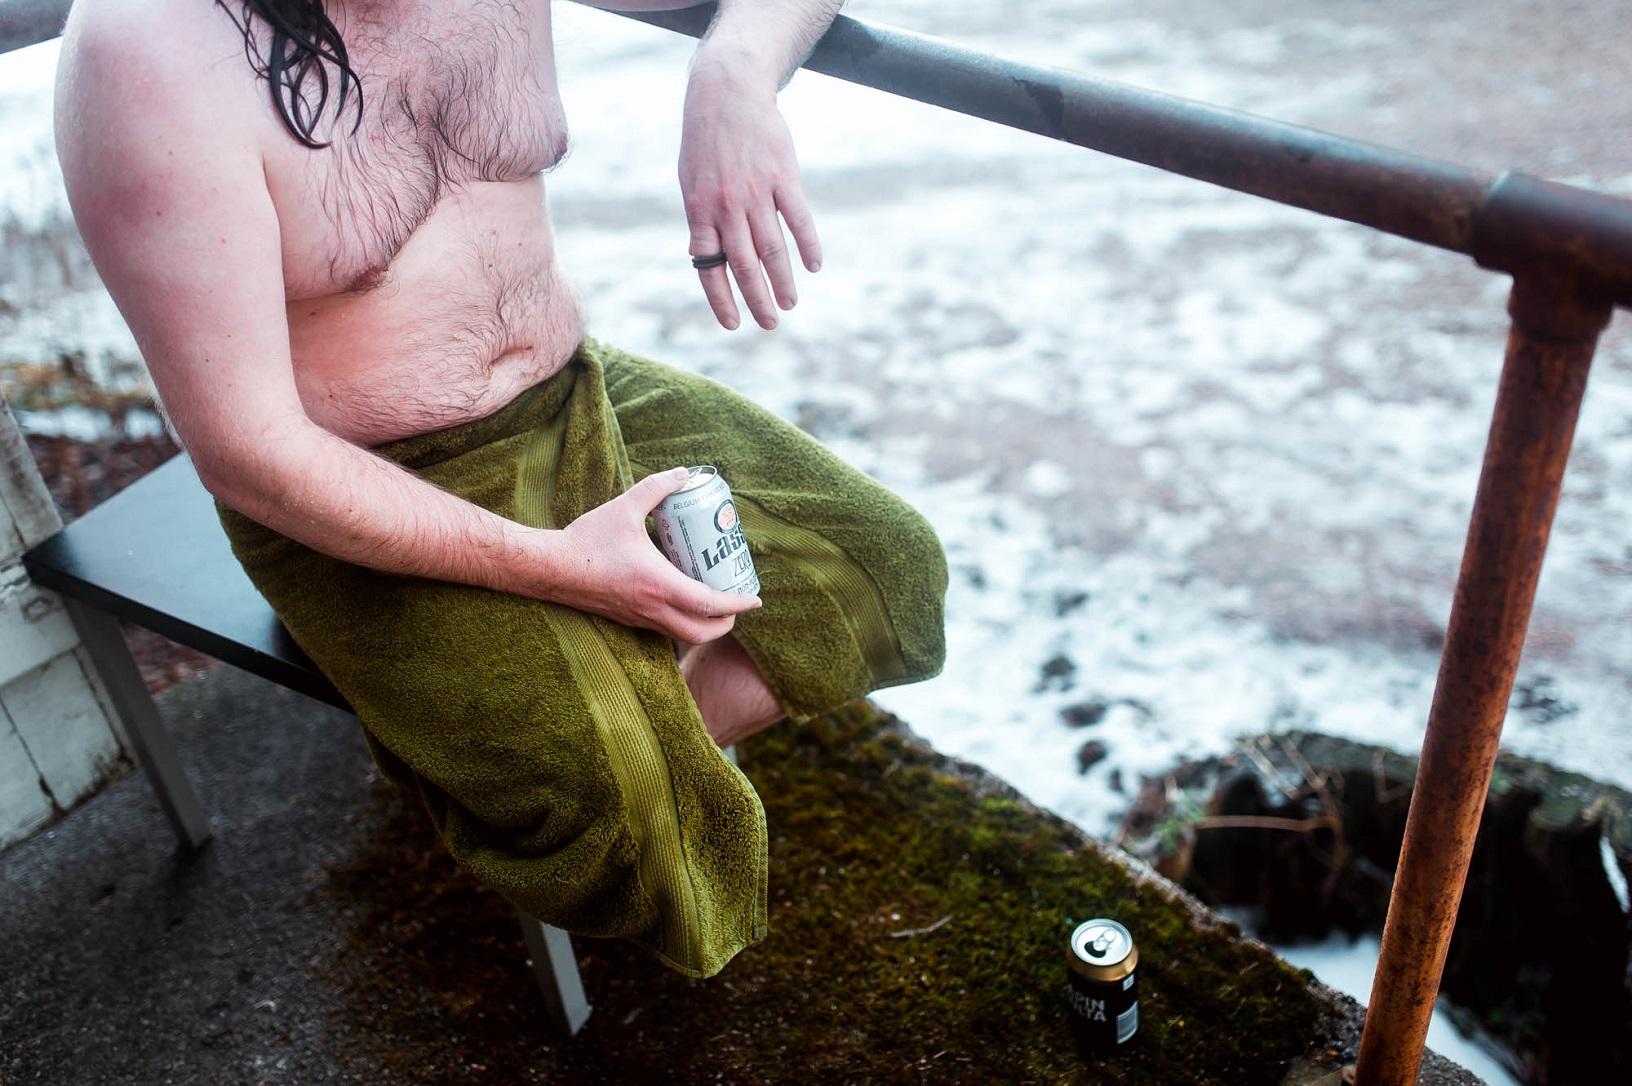 Helsinki Sauna Day 12.03.2016 / Lapinlahti